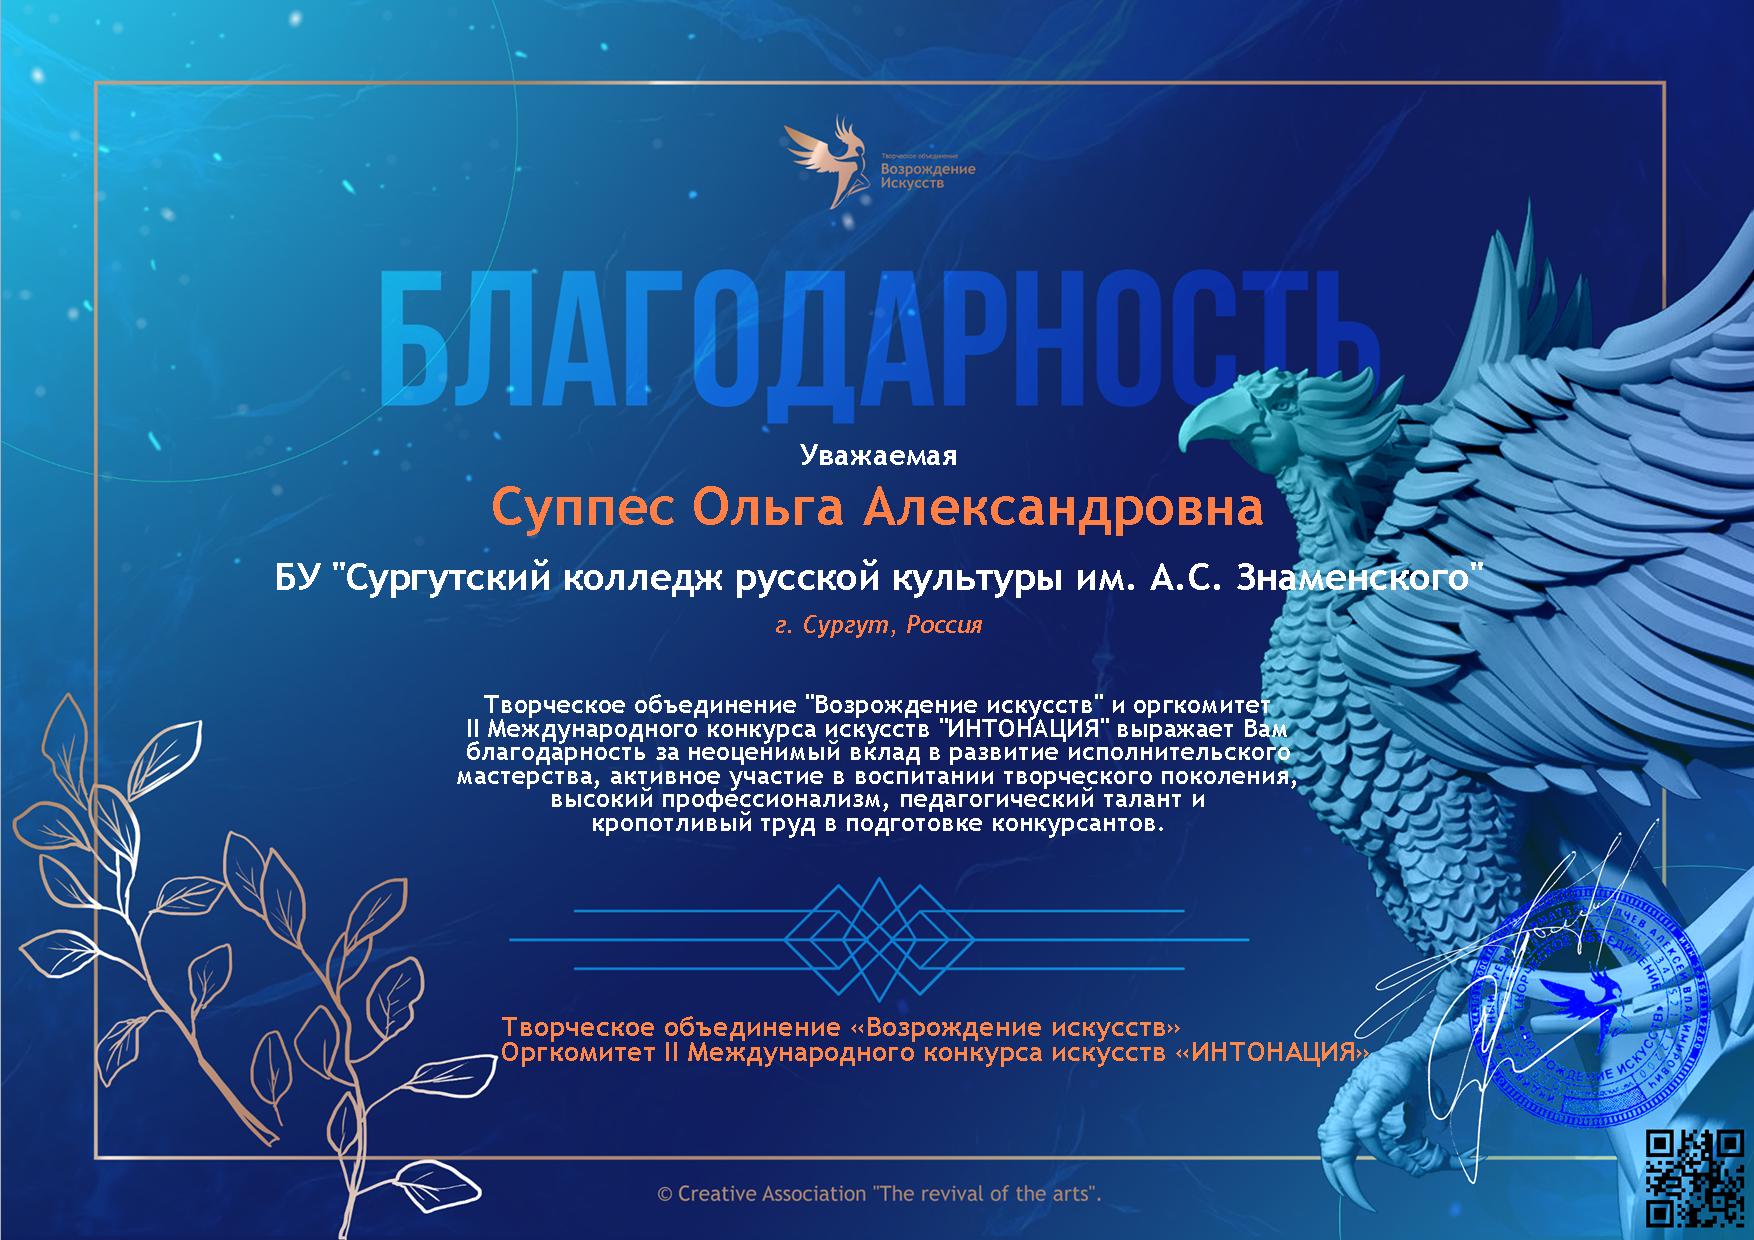 Суппес Ольга Александровна